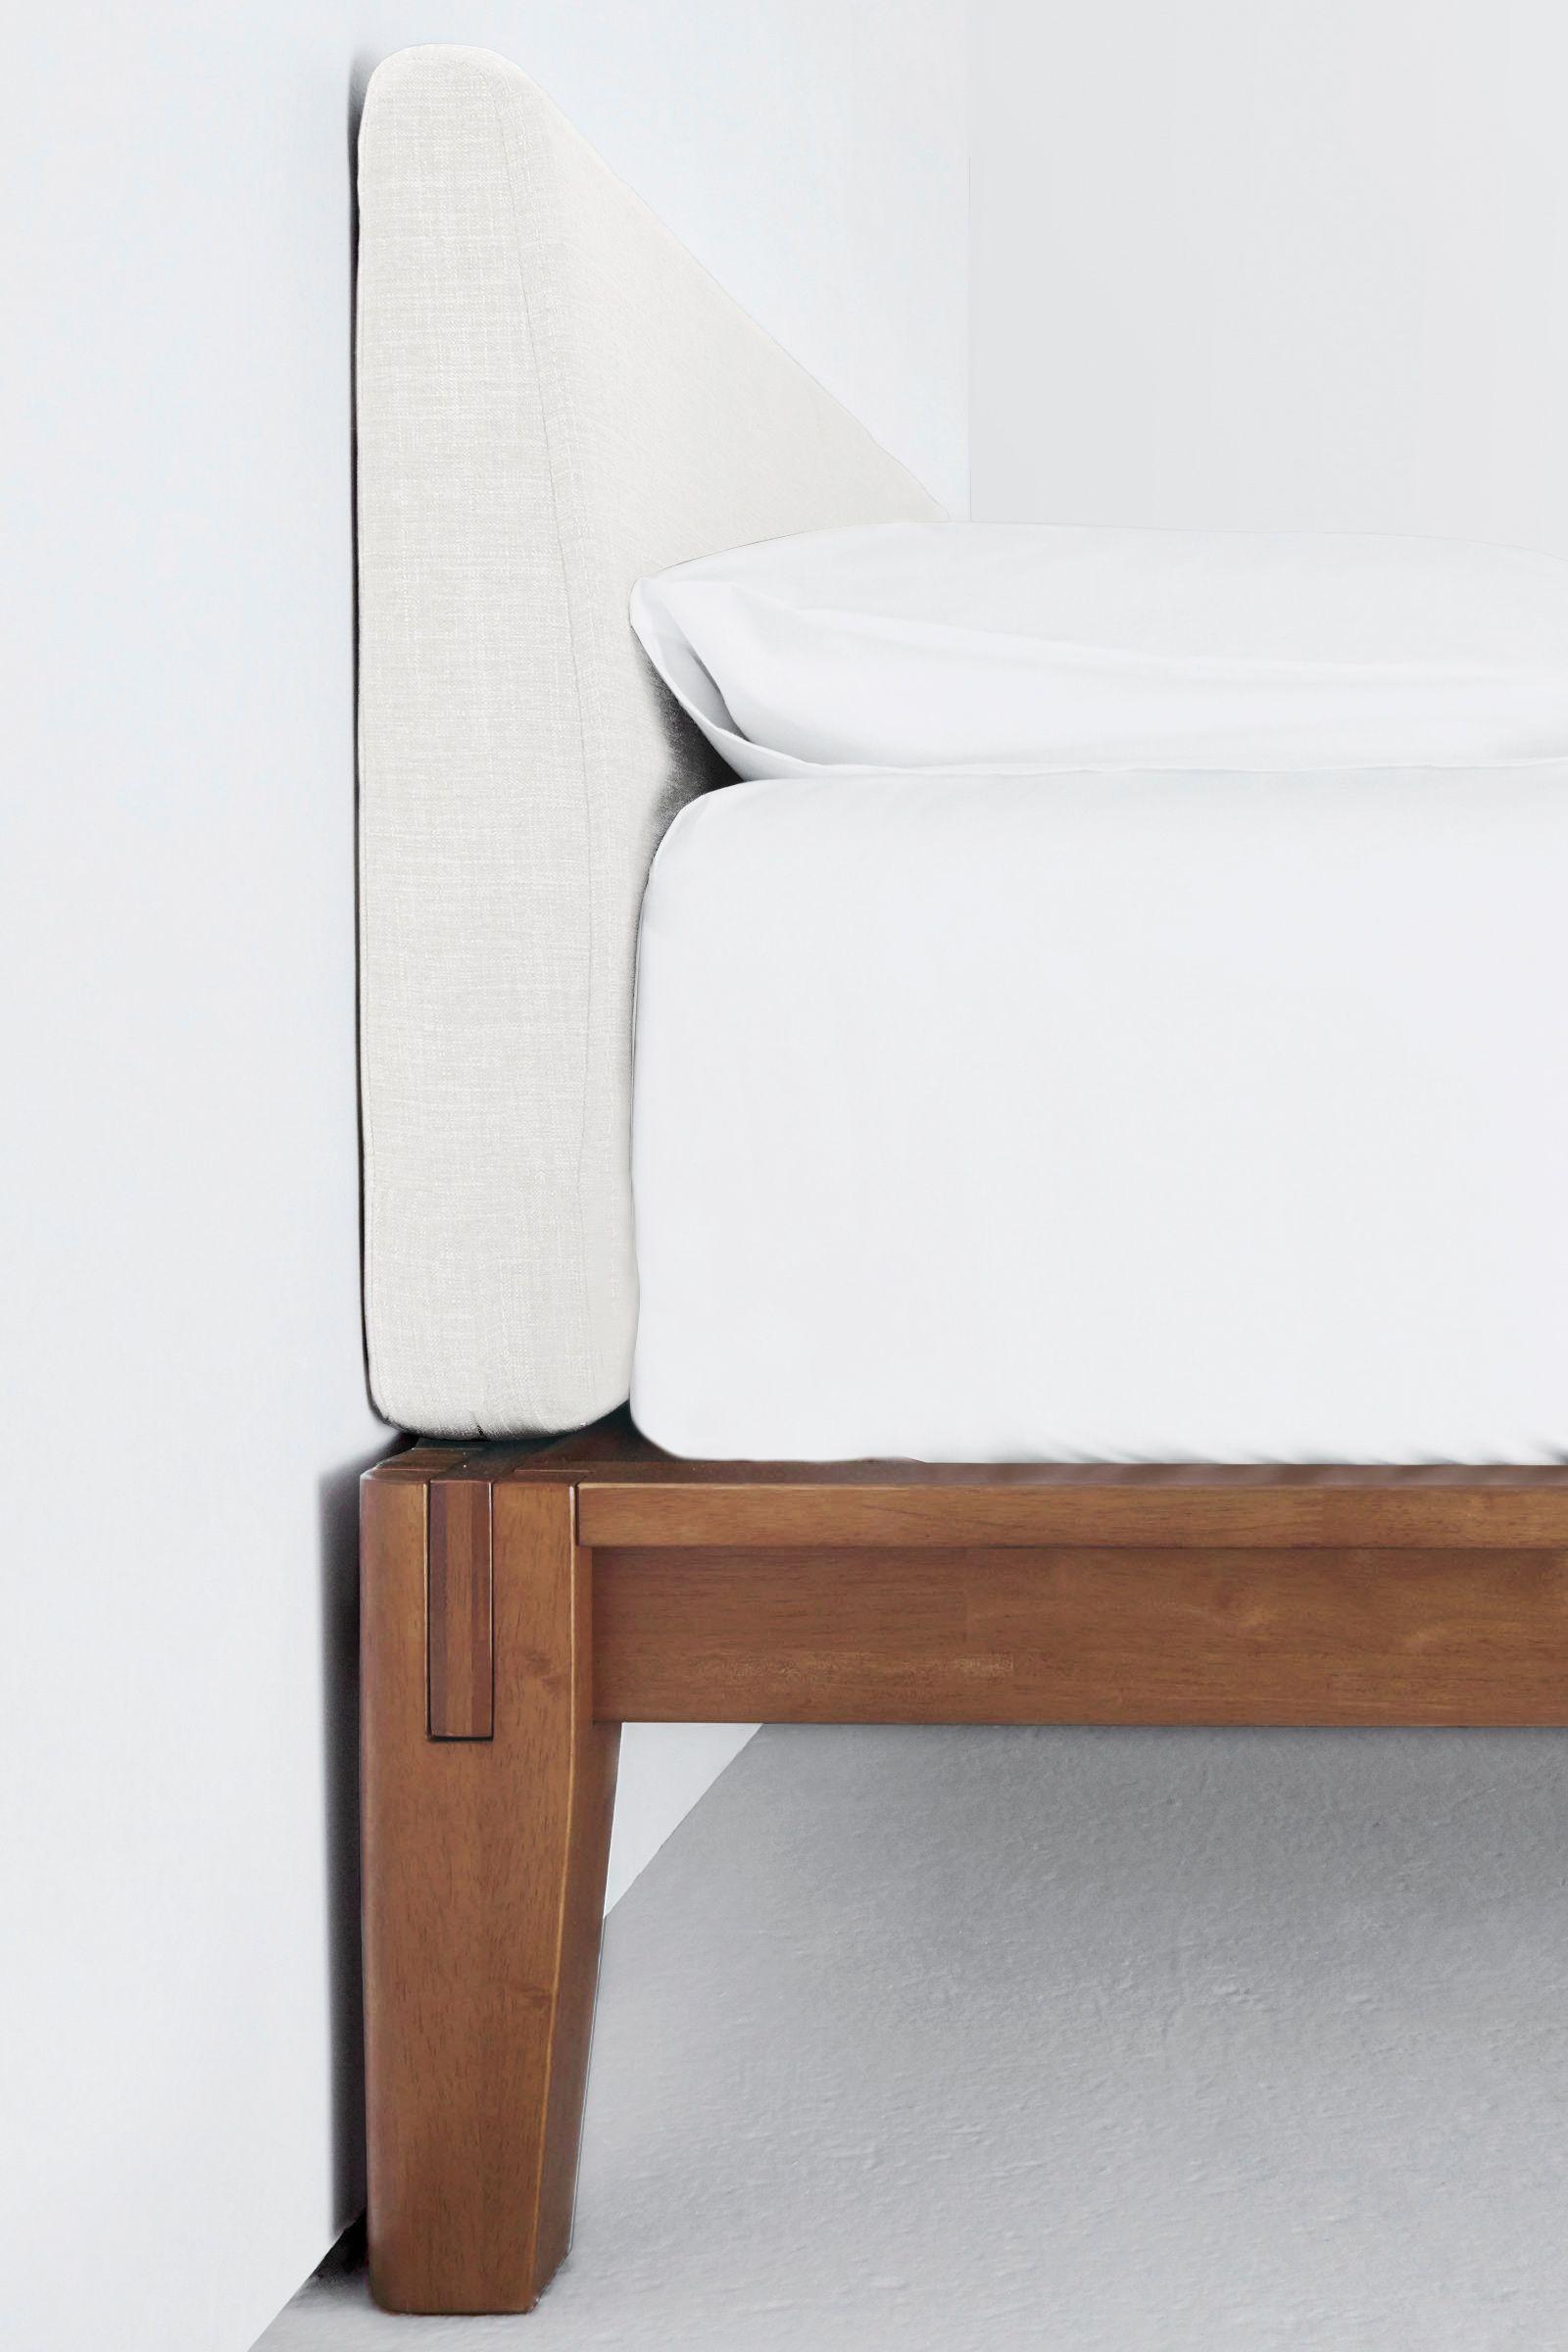 Thuma Bedtimejustgotbetter Bedframe With Images Bed Frame